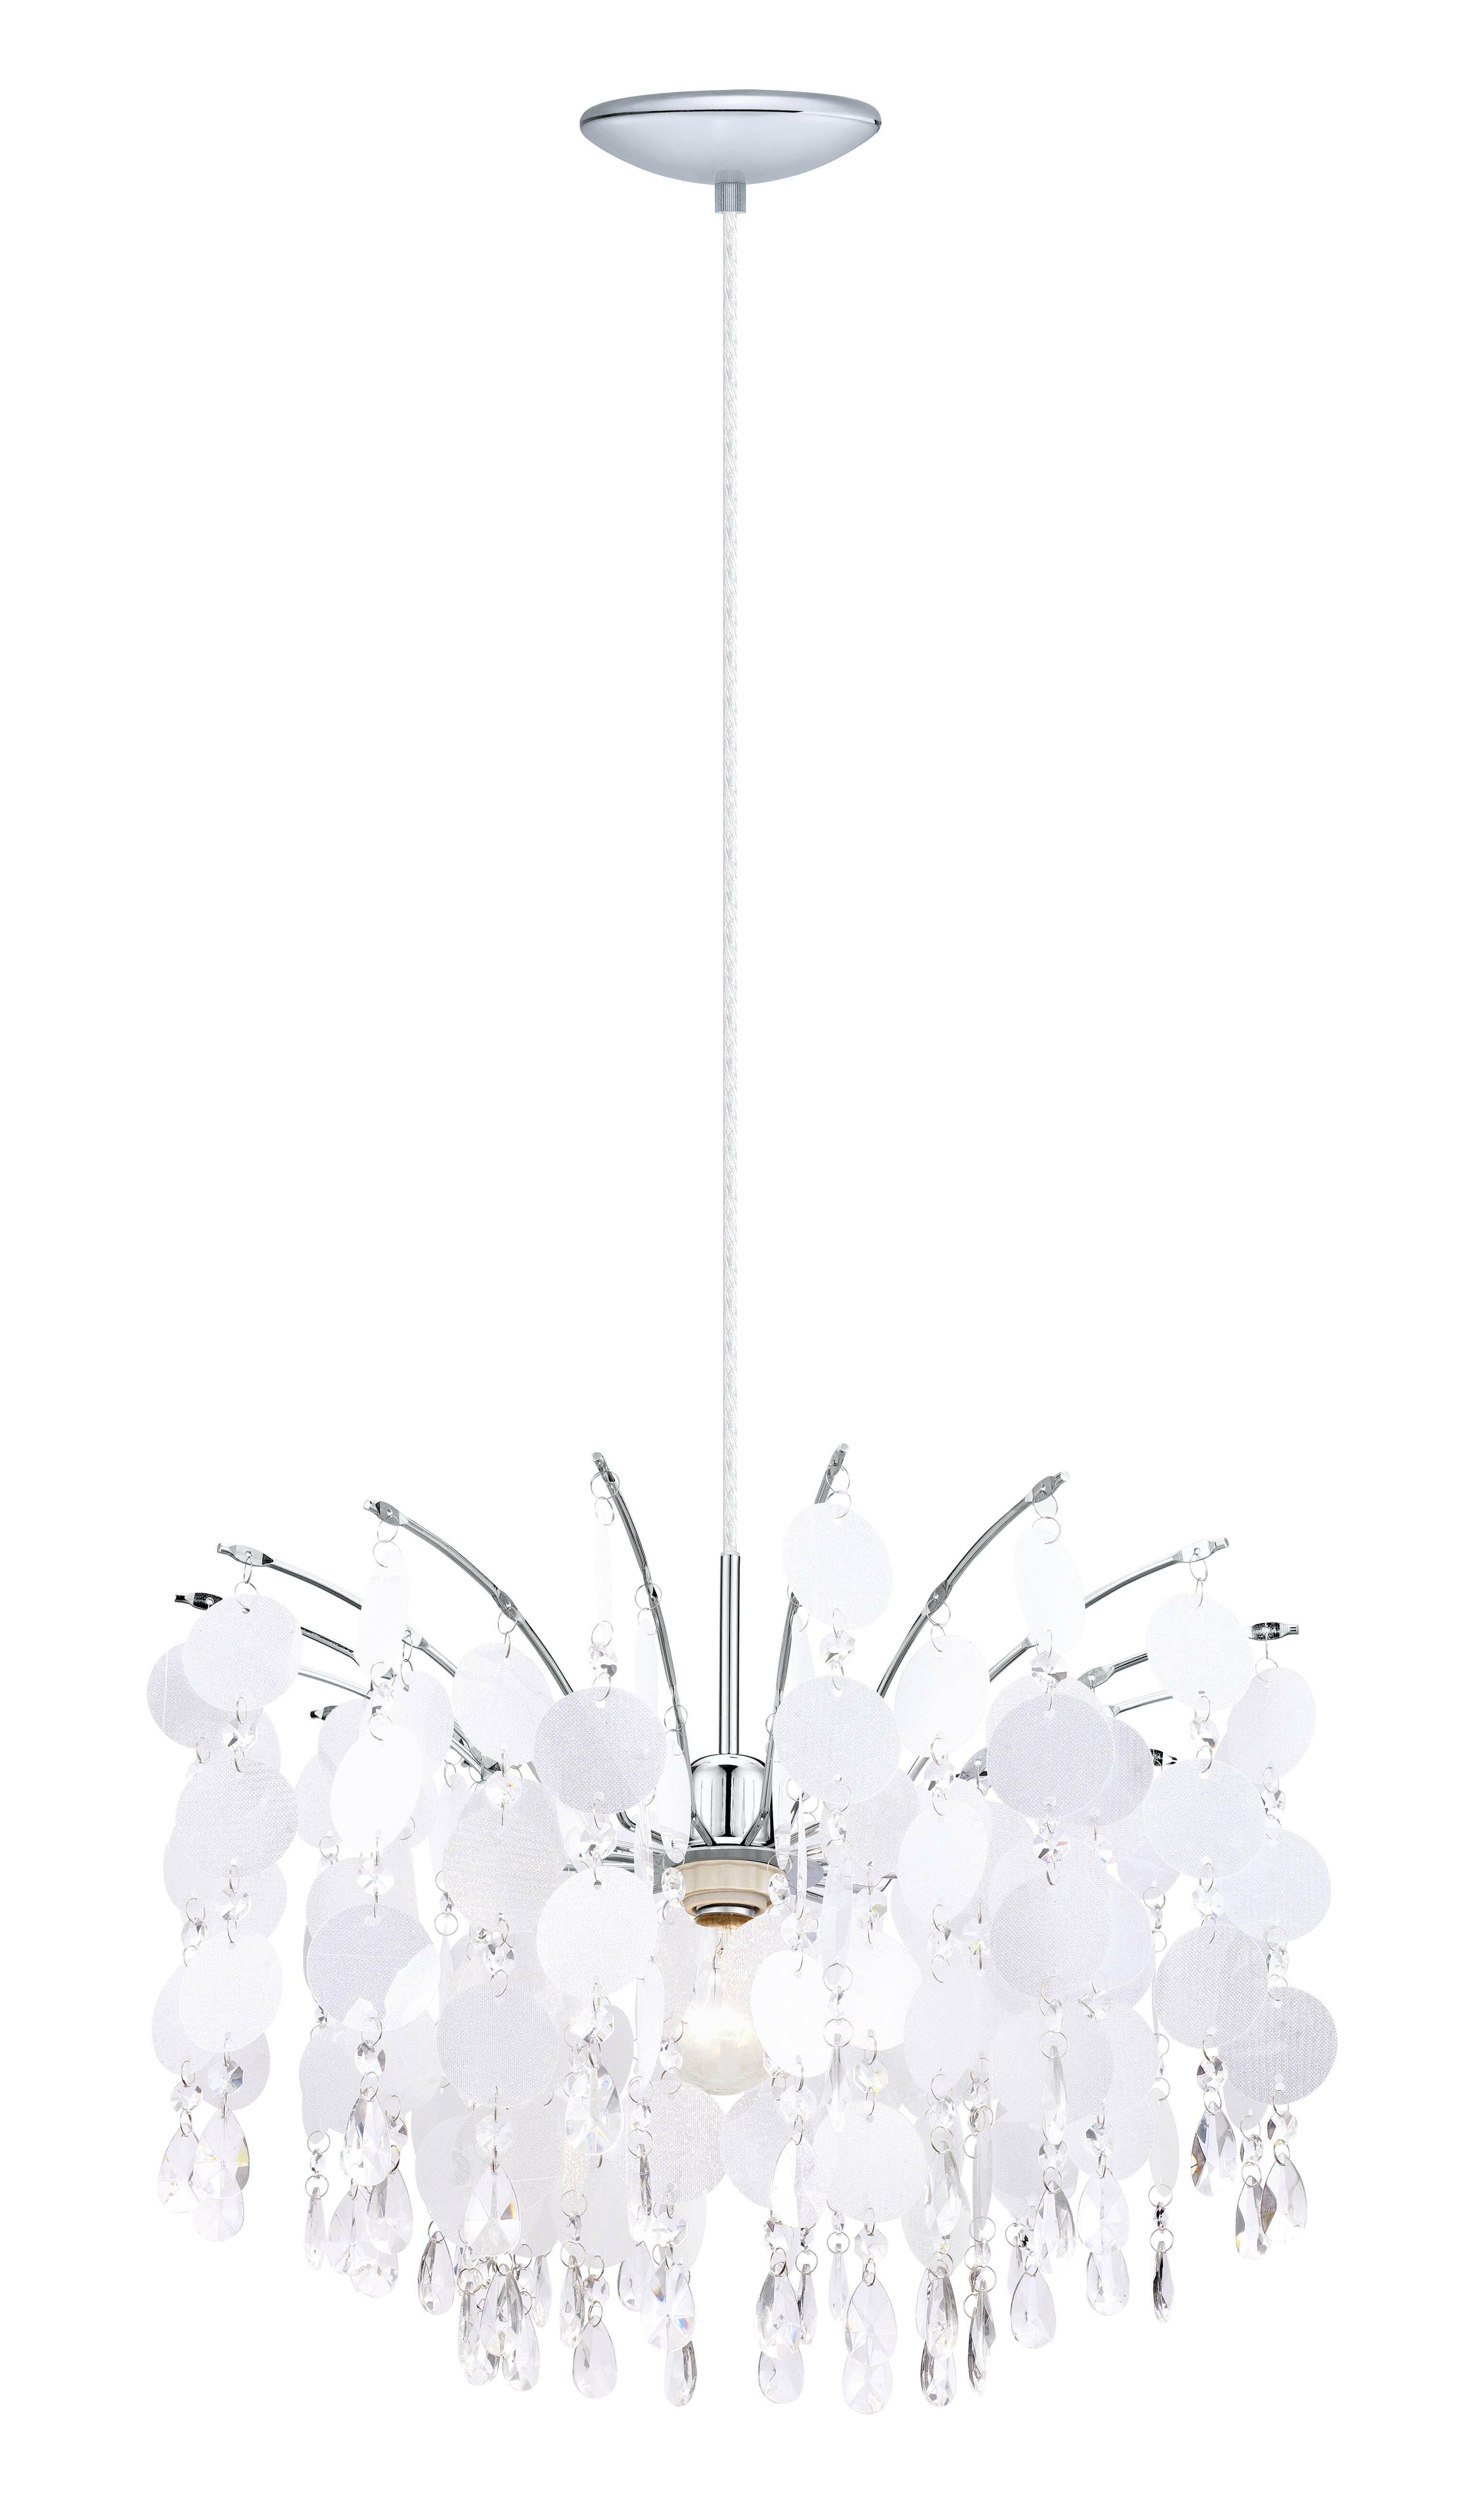 lzf dandelion light led geometric pendant wayfair Brown Interior Decor quickview